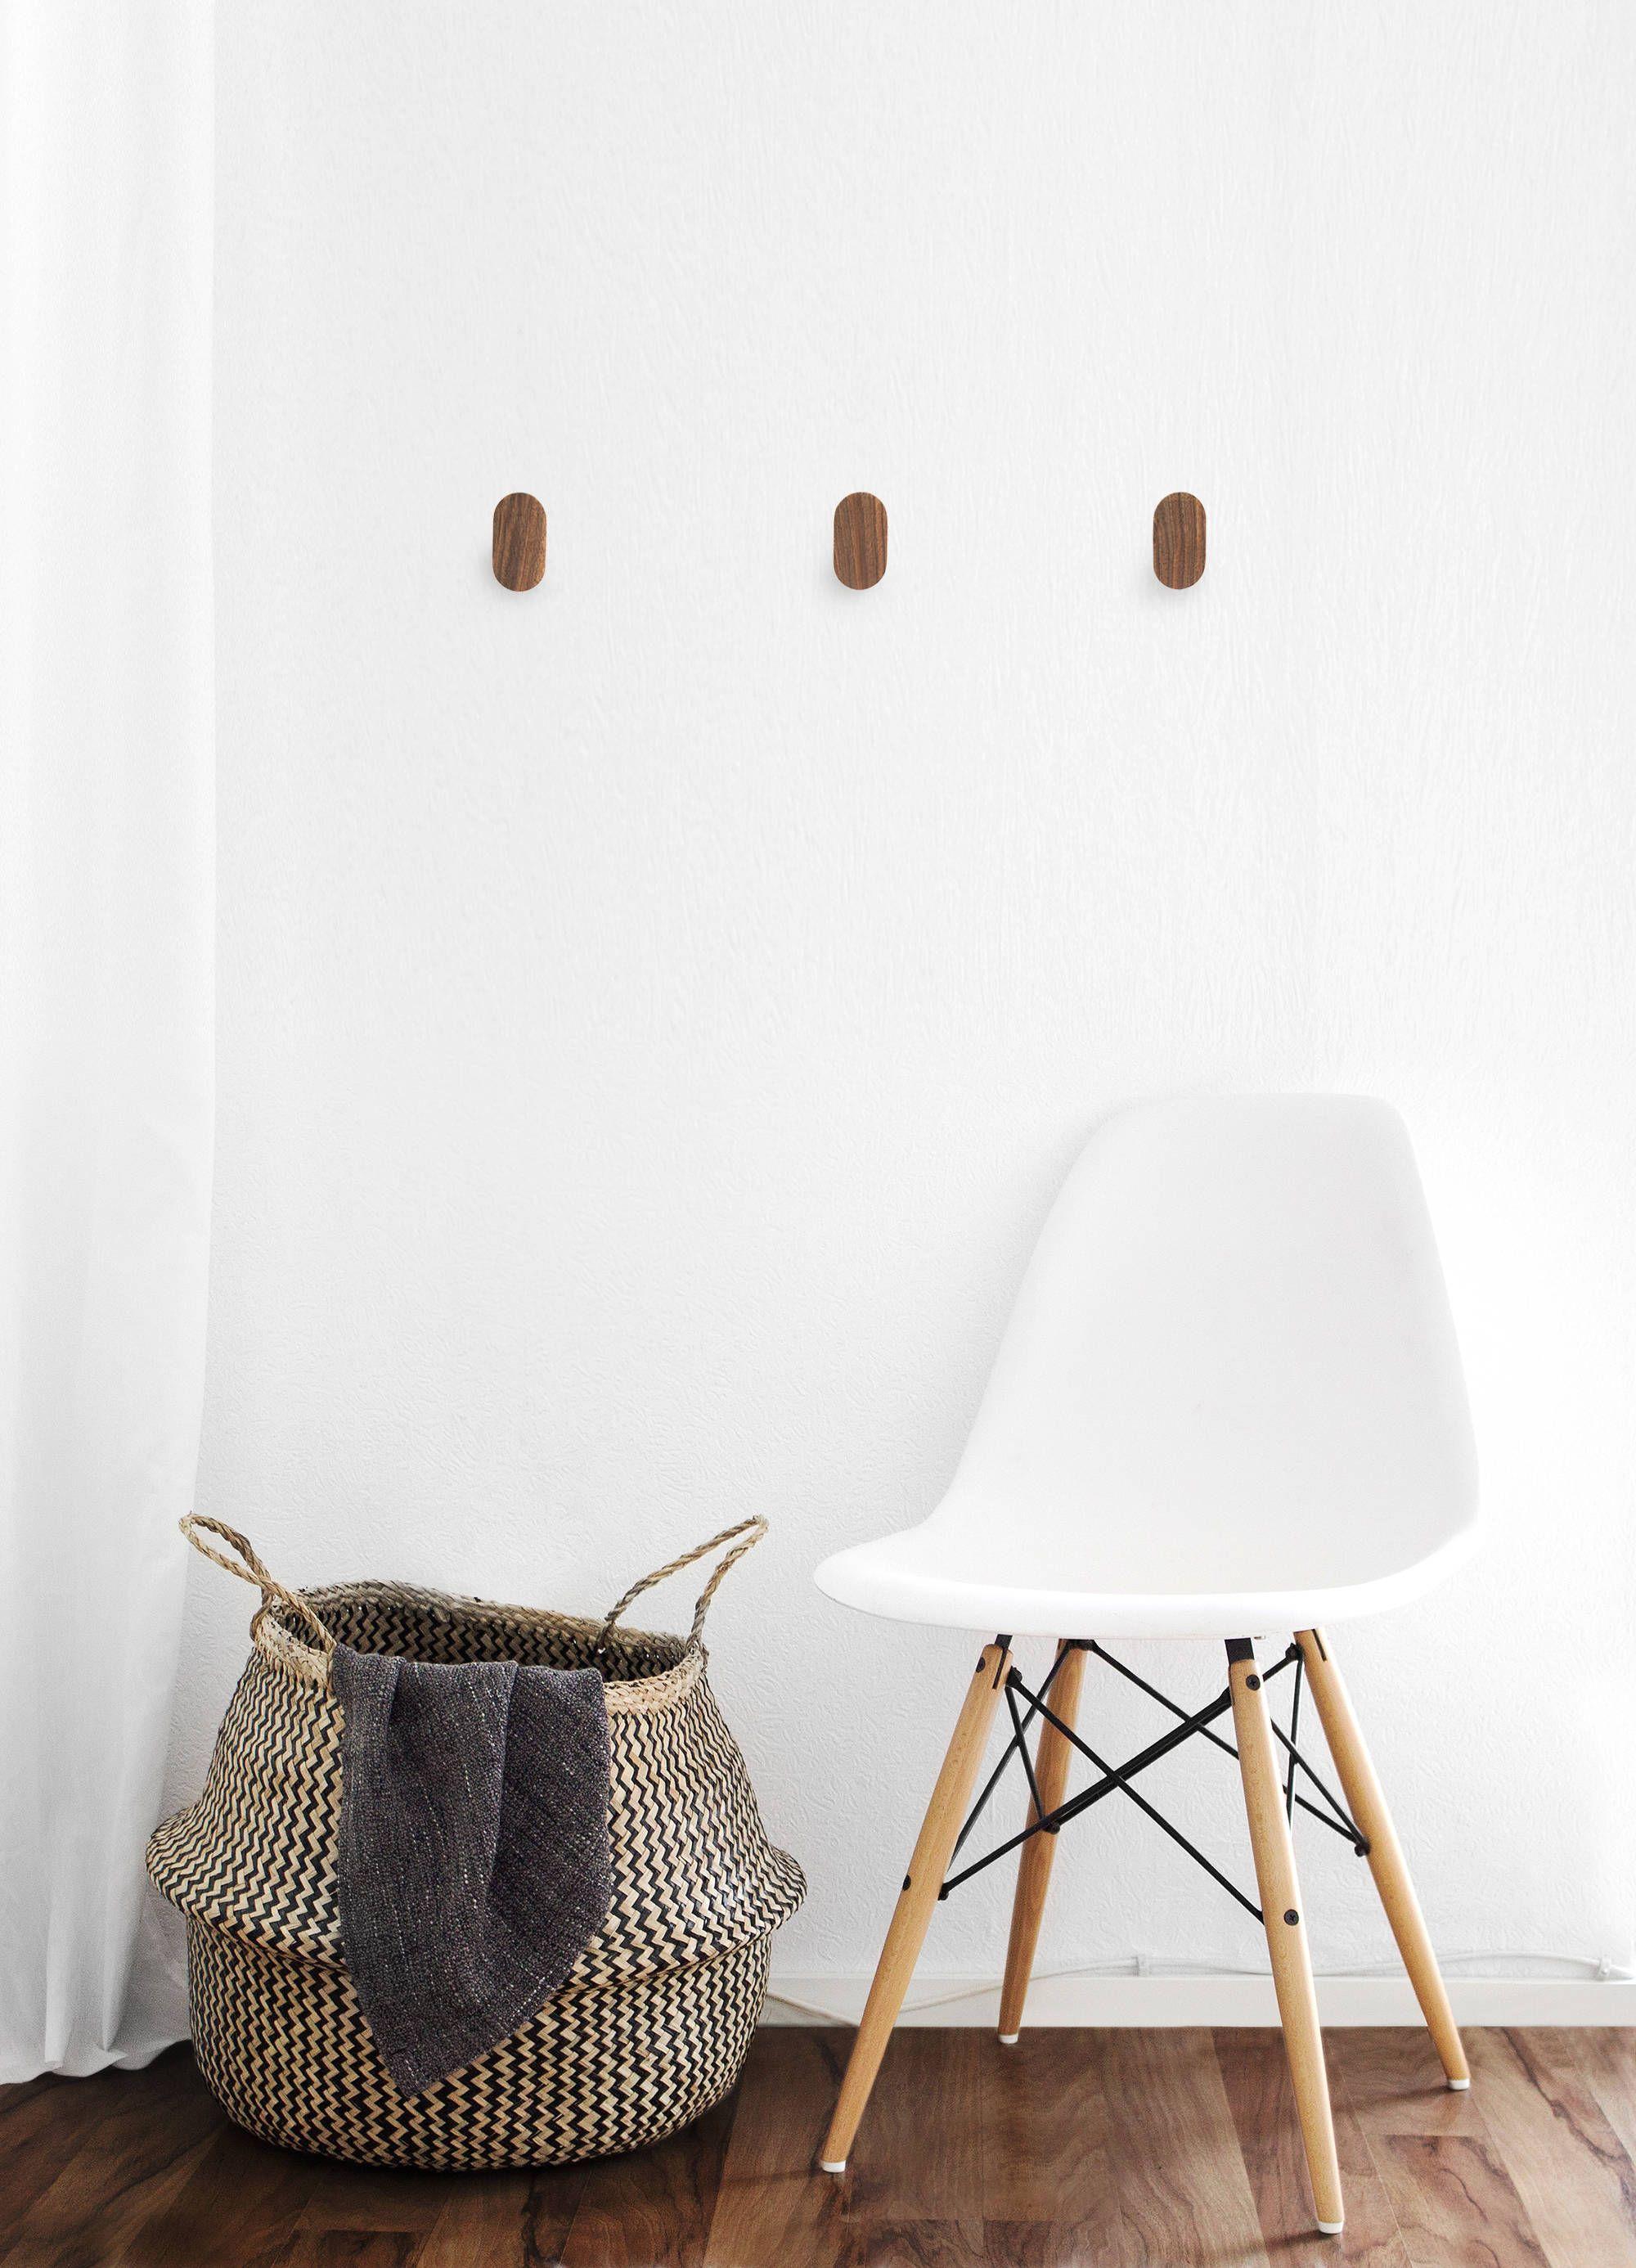 Walnut Wall Hooks Modern Minimal Wooden Decor Hallway Entryway Bedroom Bathrom Kitchen Coat Hook